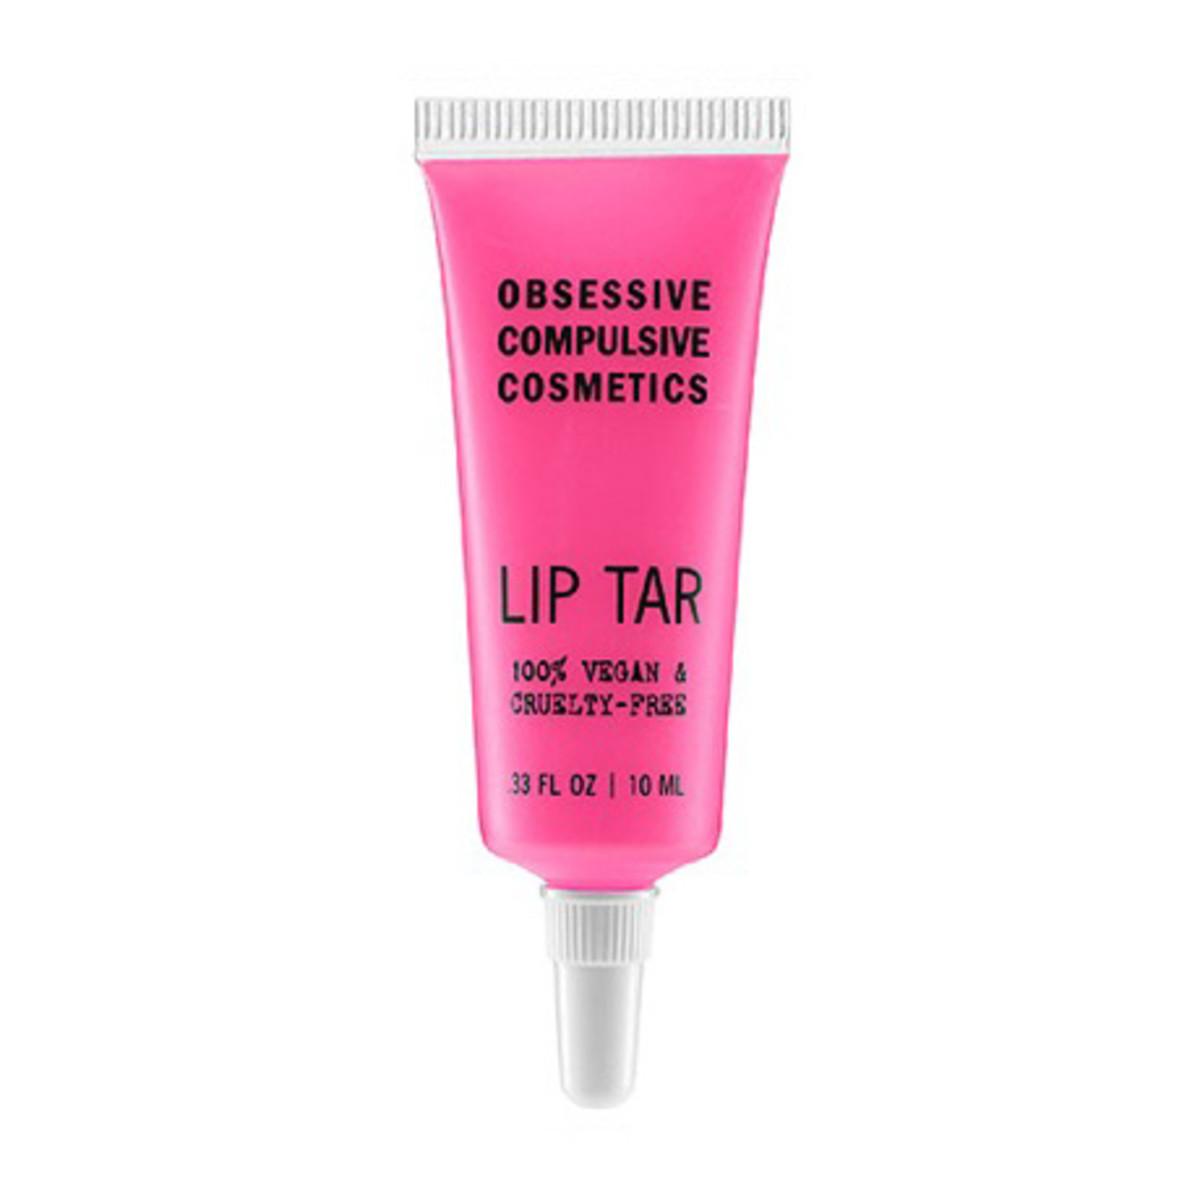 Obsessive Compulsive Cosmetics Lip Tar in Nylon